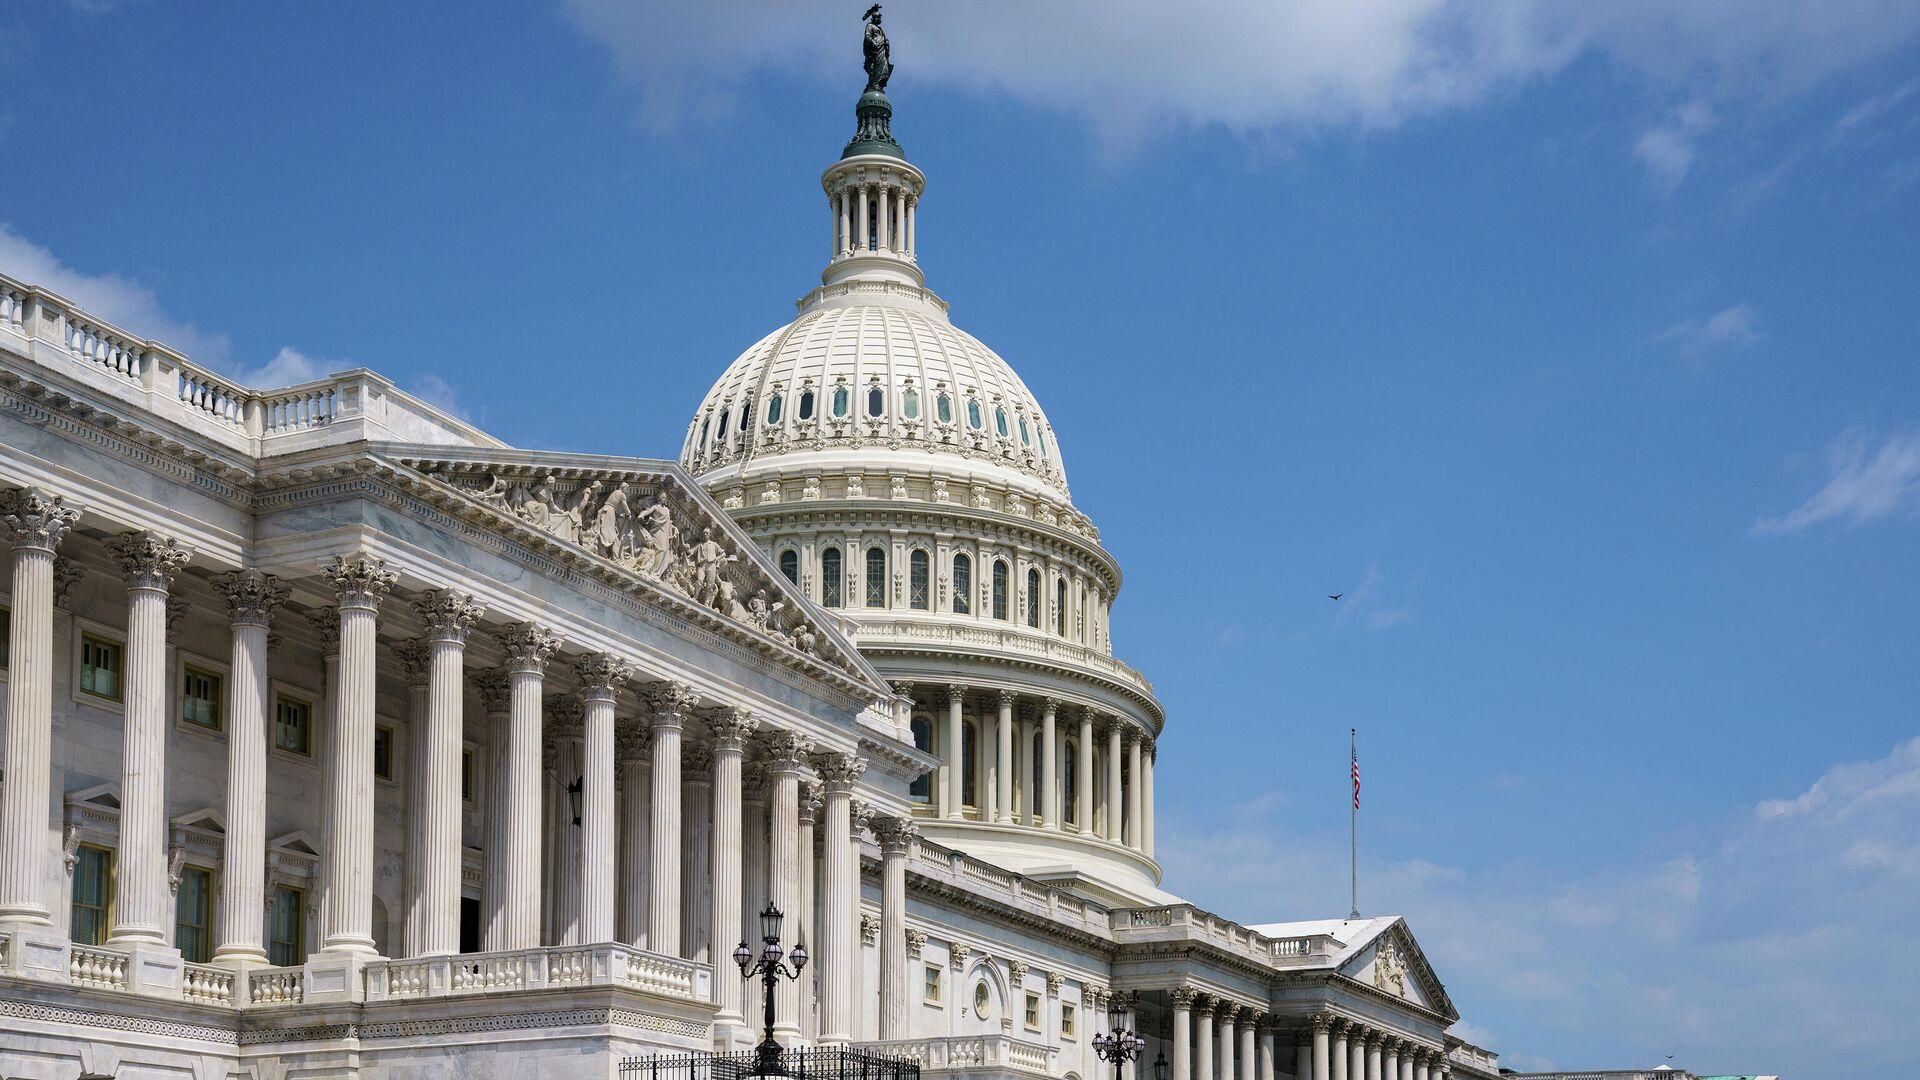 Das Kapitol, Sitz des US-Kongresses. washington, 14. Juni 2021 - SNA, 1920, 30.09.2021